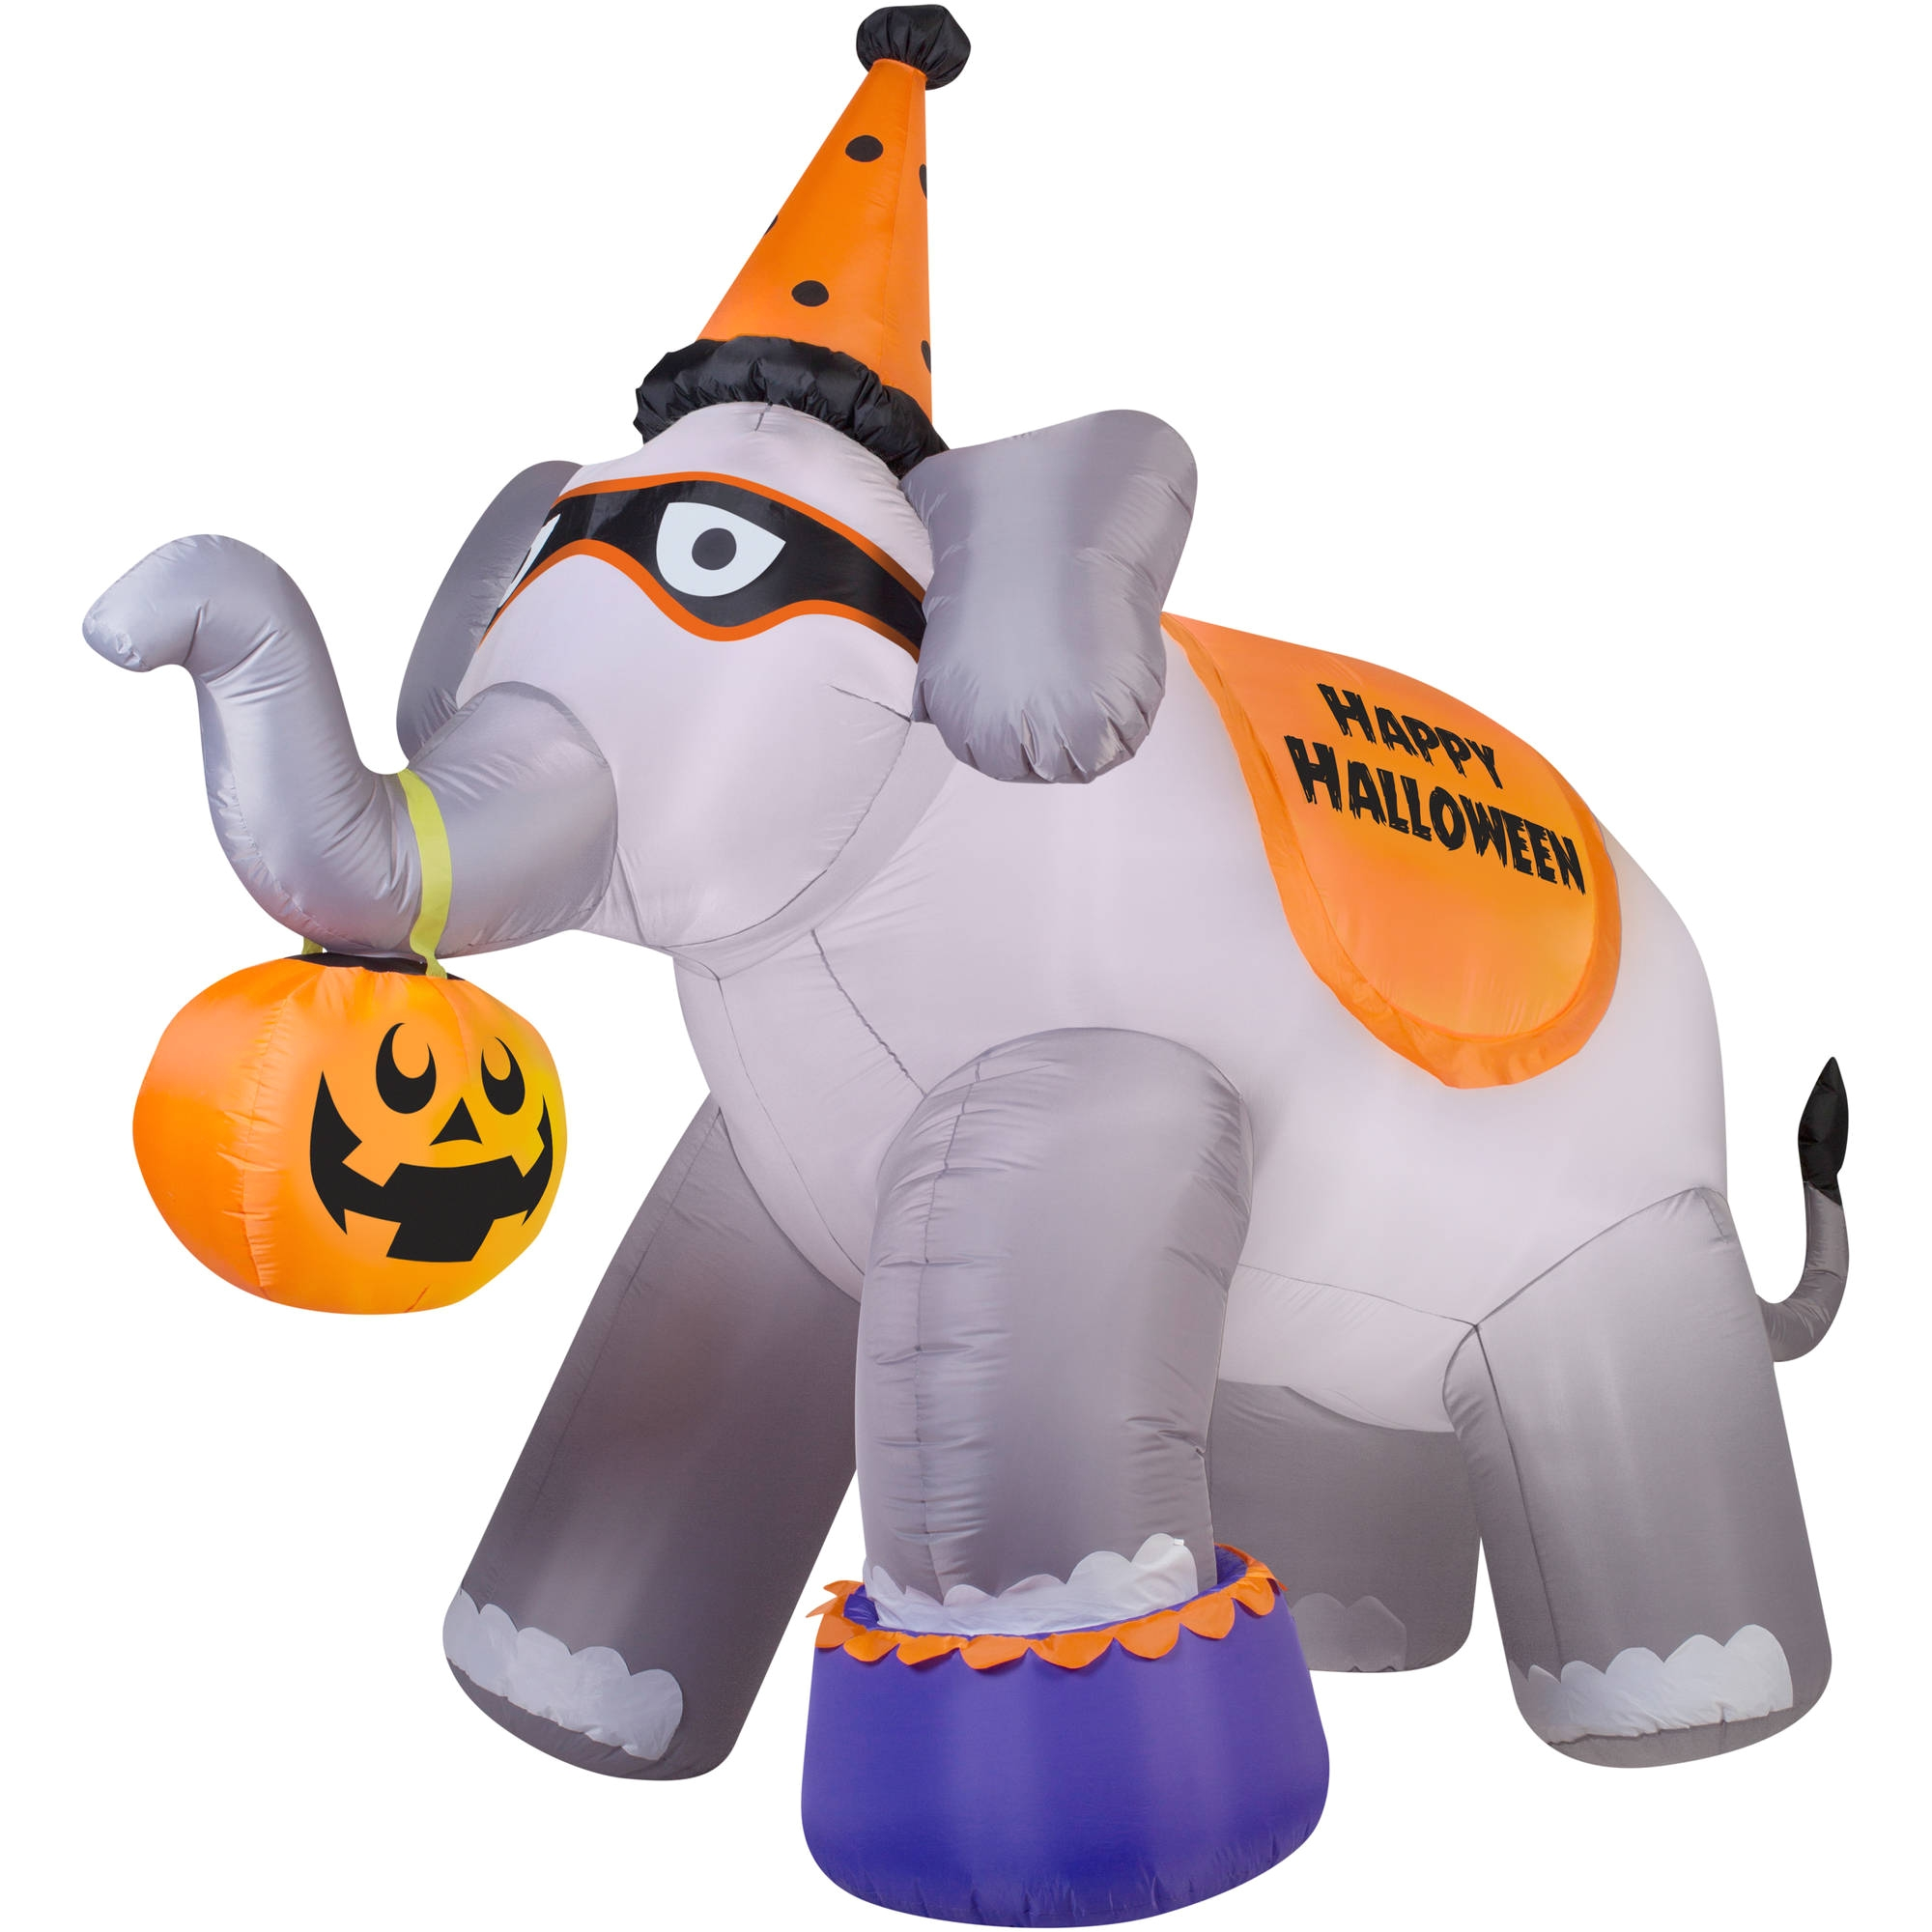 gemmy airblown inflatable 9 x 11 giant elephant halloween decoration walmart com